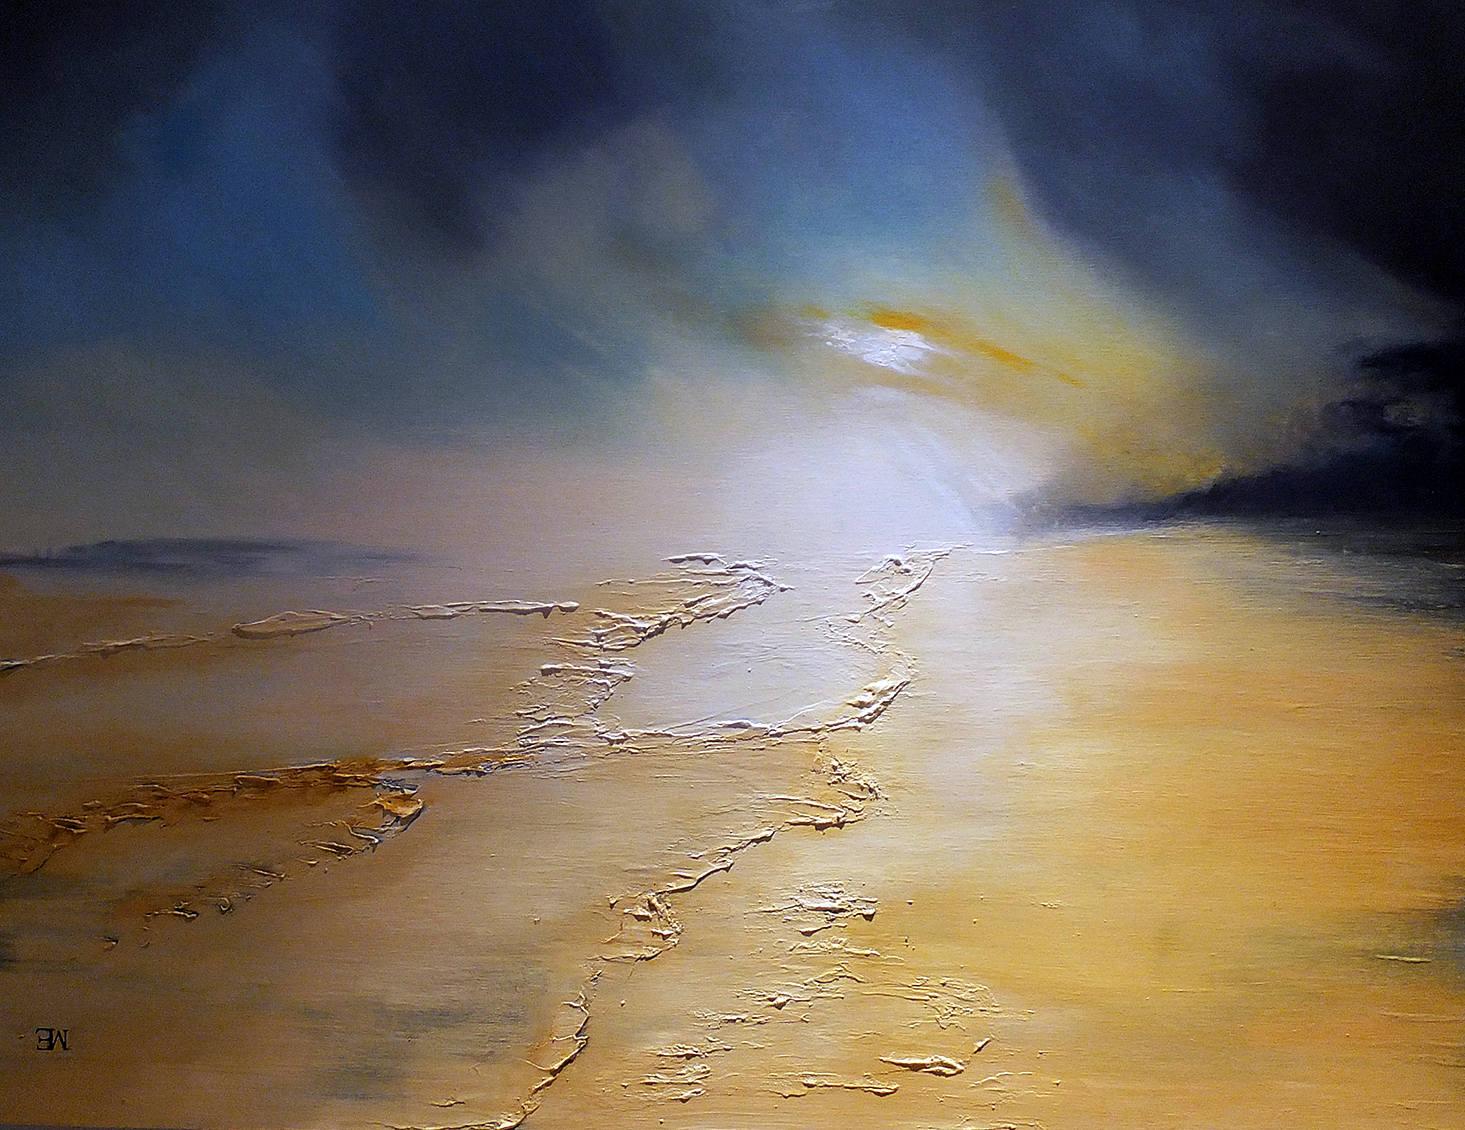 Branksome Beach - Poole mainsm edited-2_edited-1